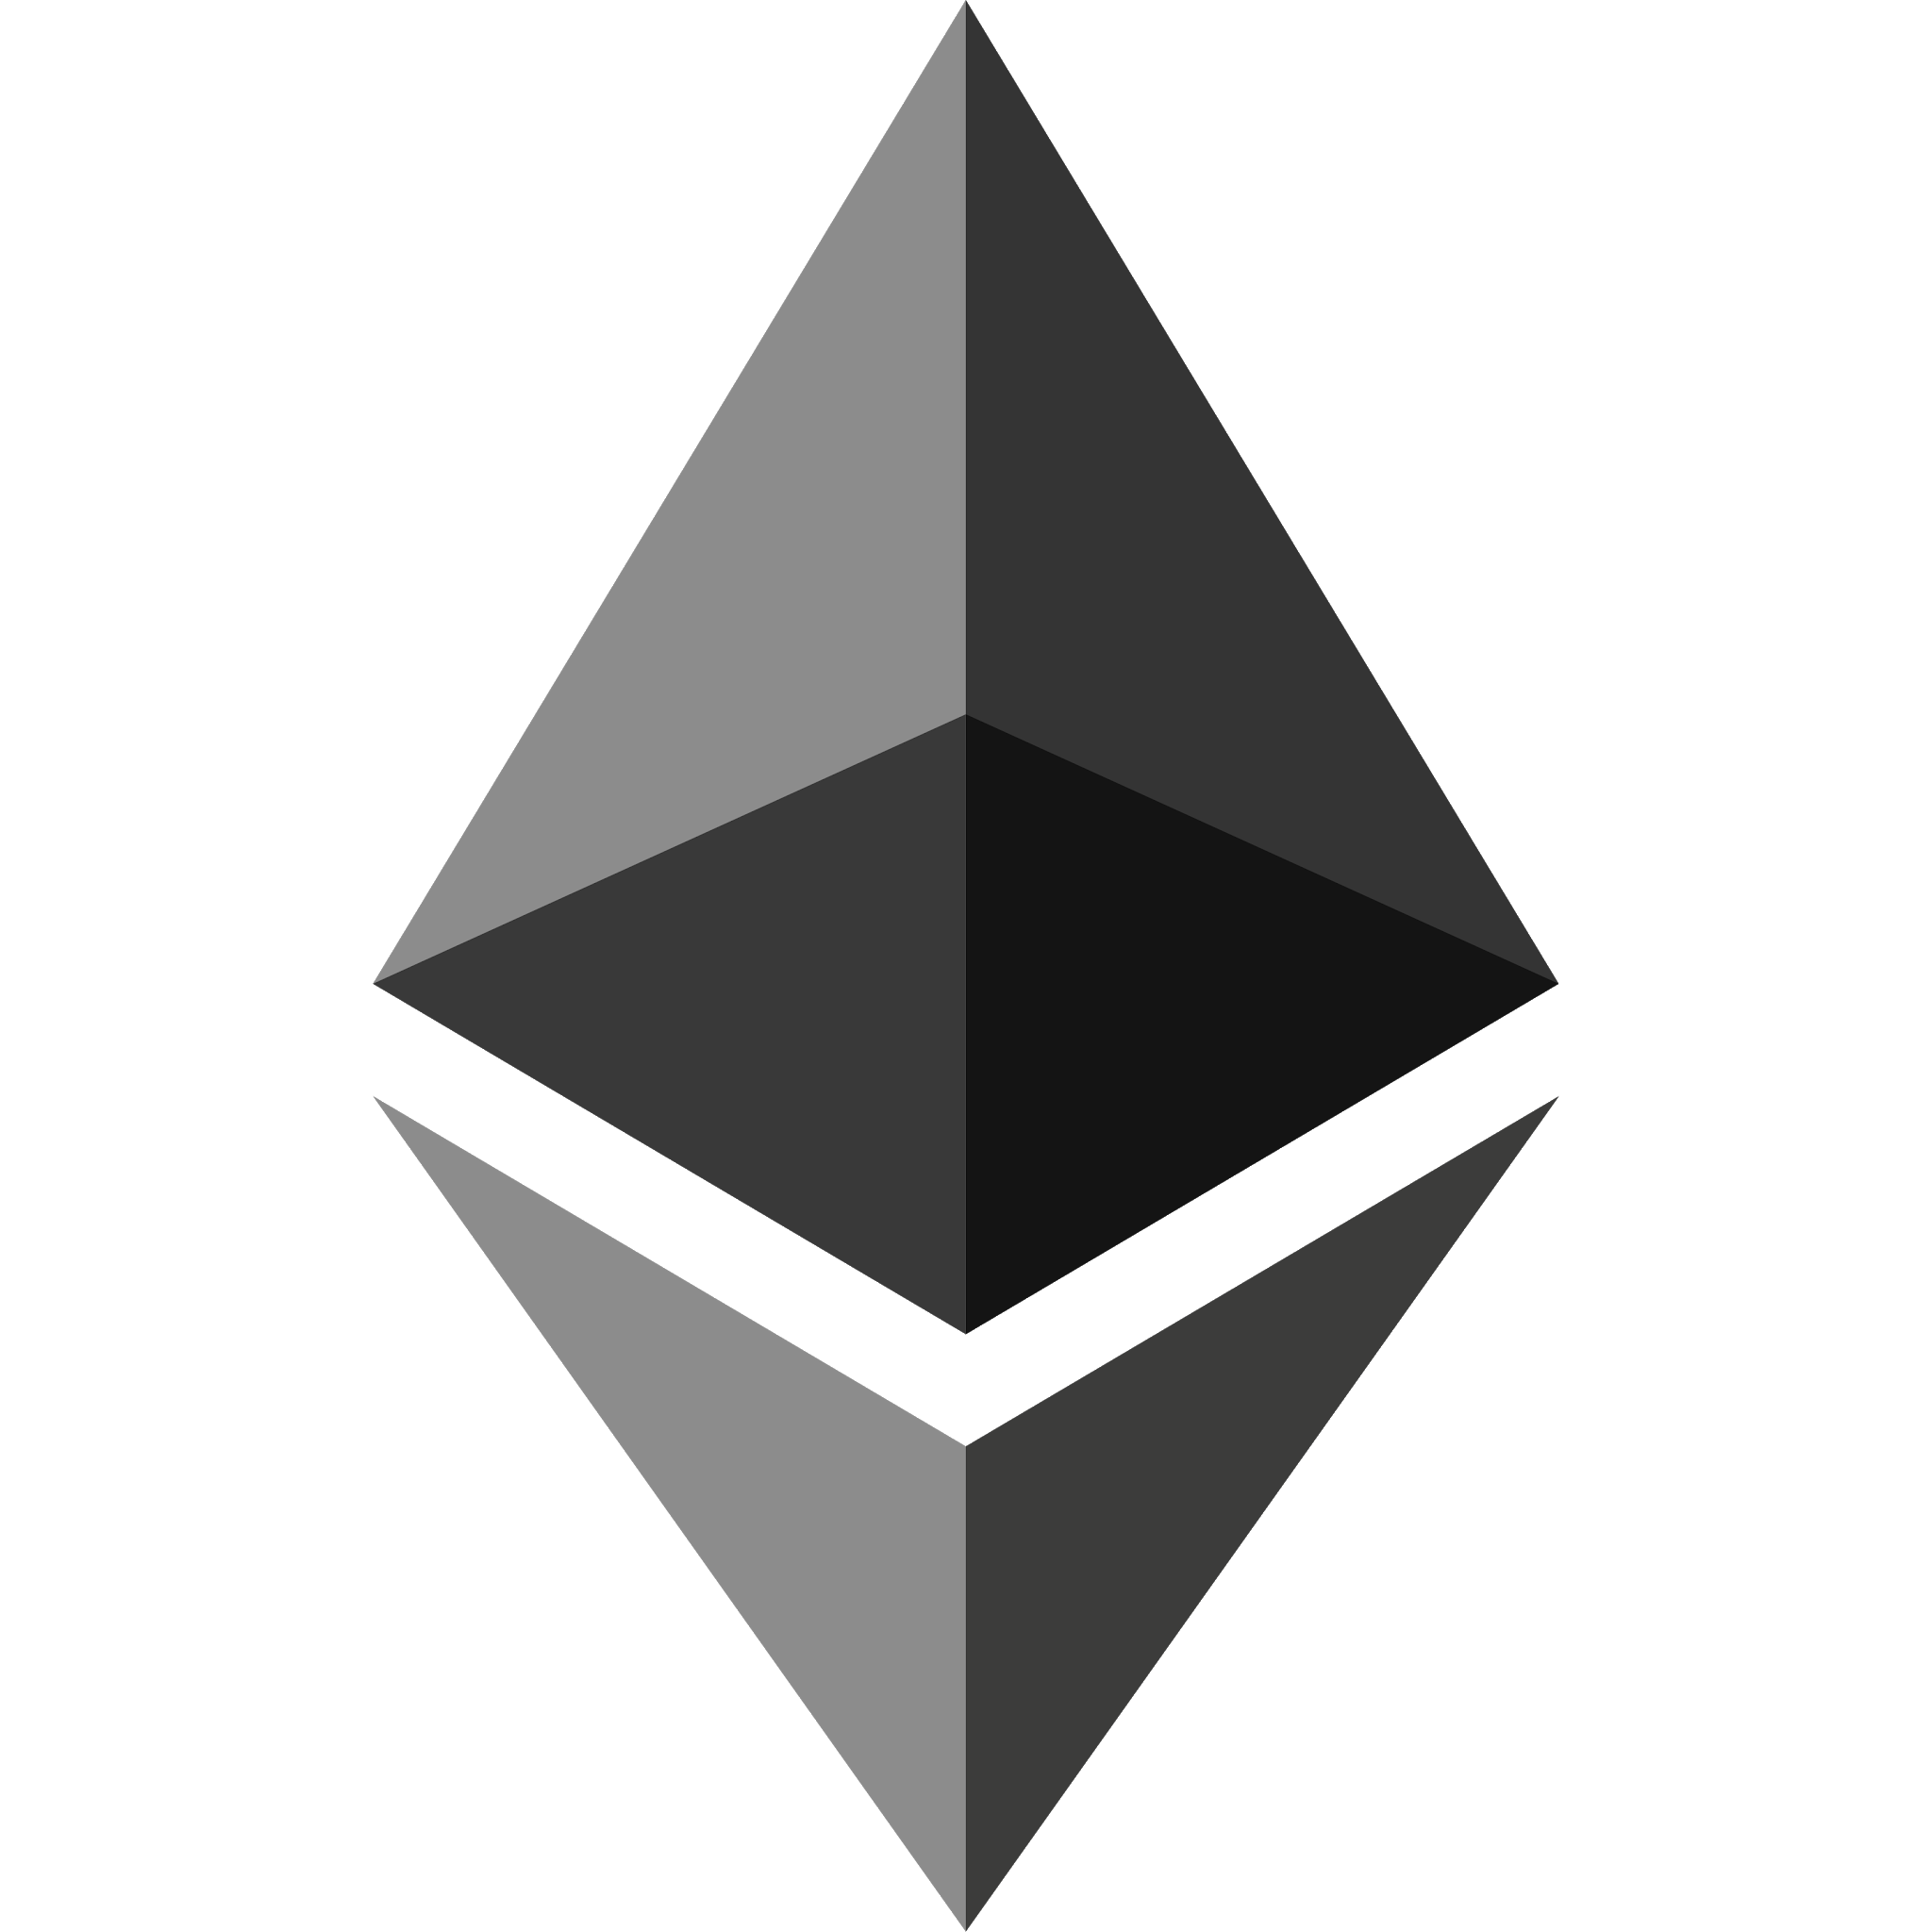 ethereum ether eth logo transparent png background free download